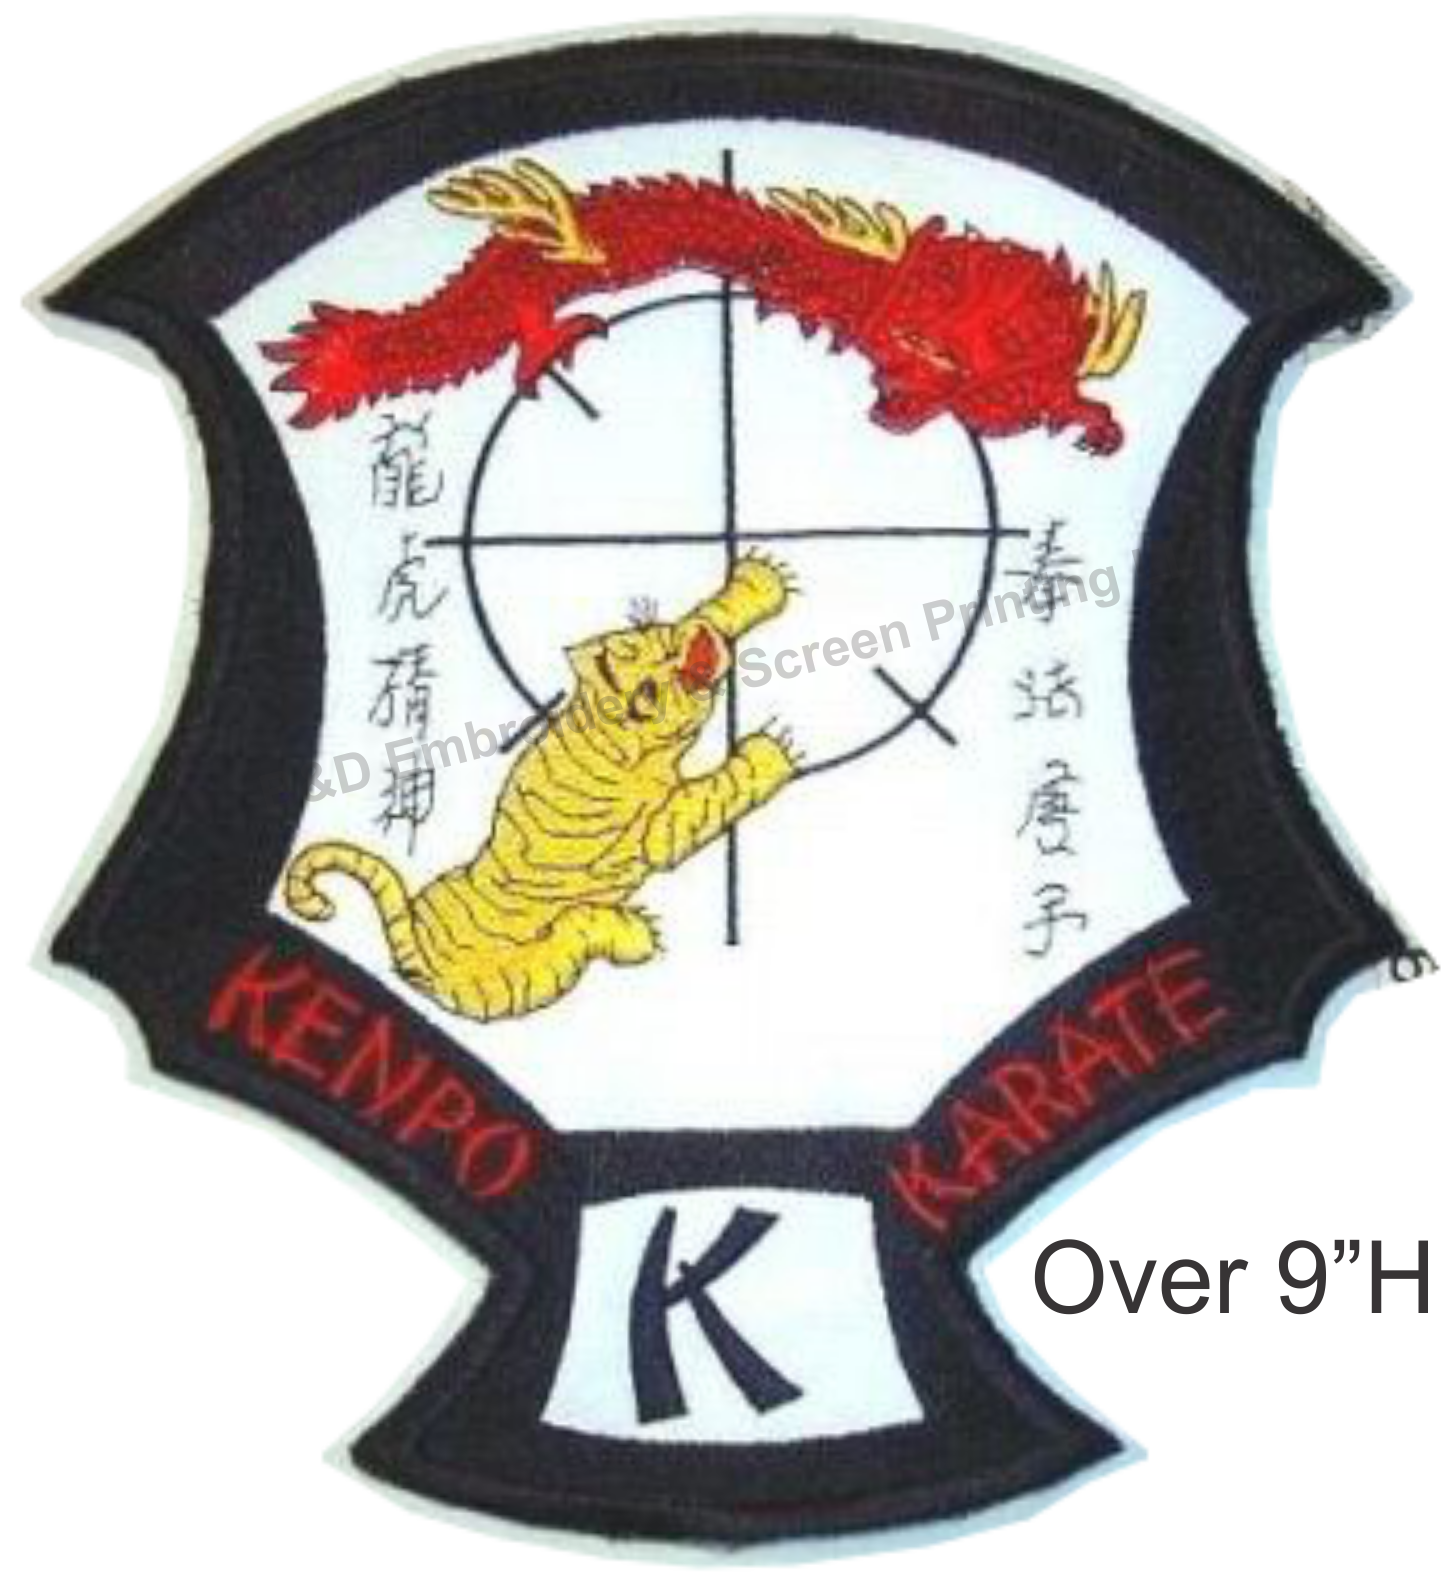 About Kempo Karate - Kempo World Kenpo Association